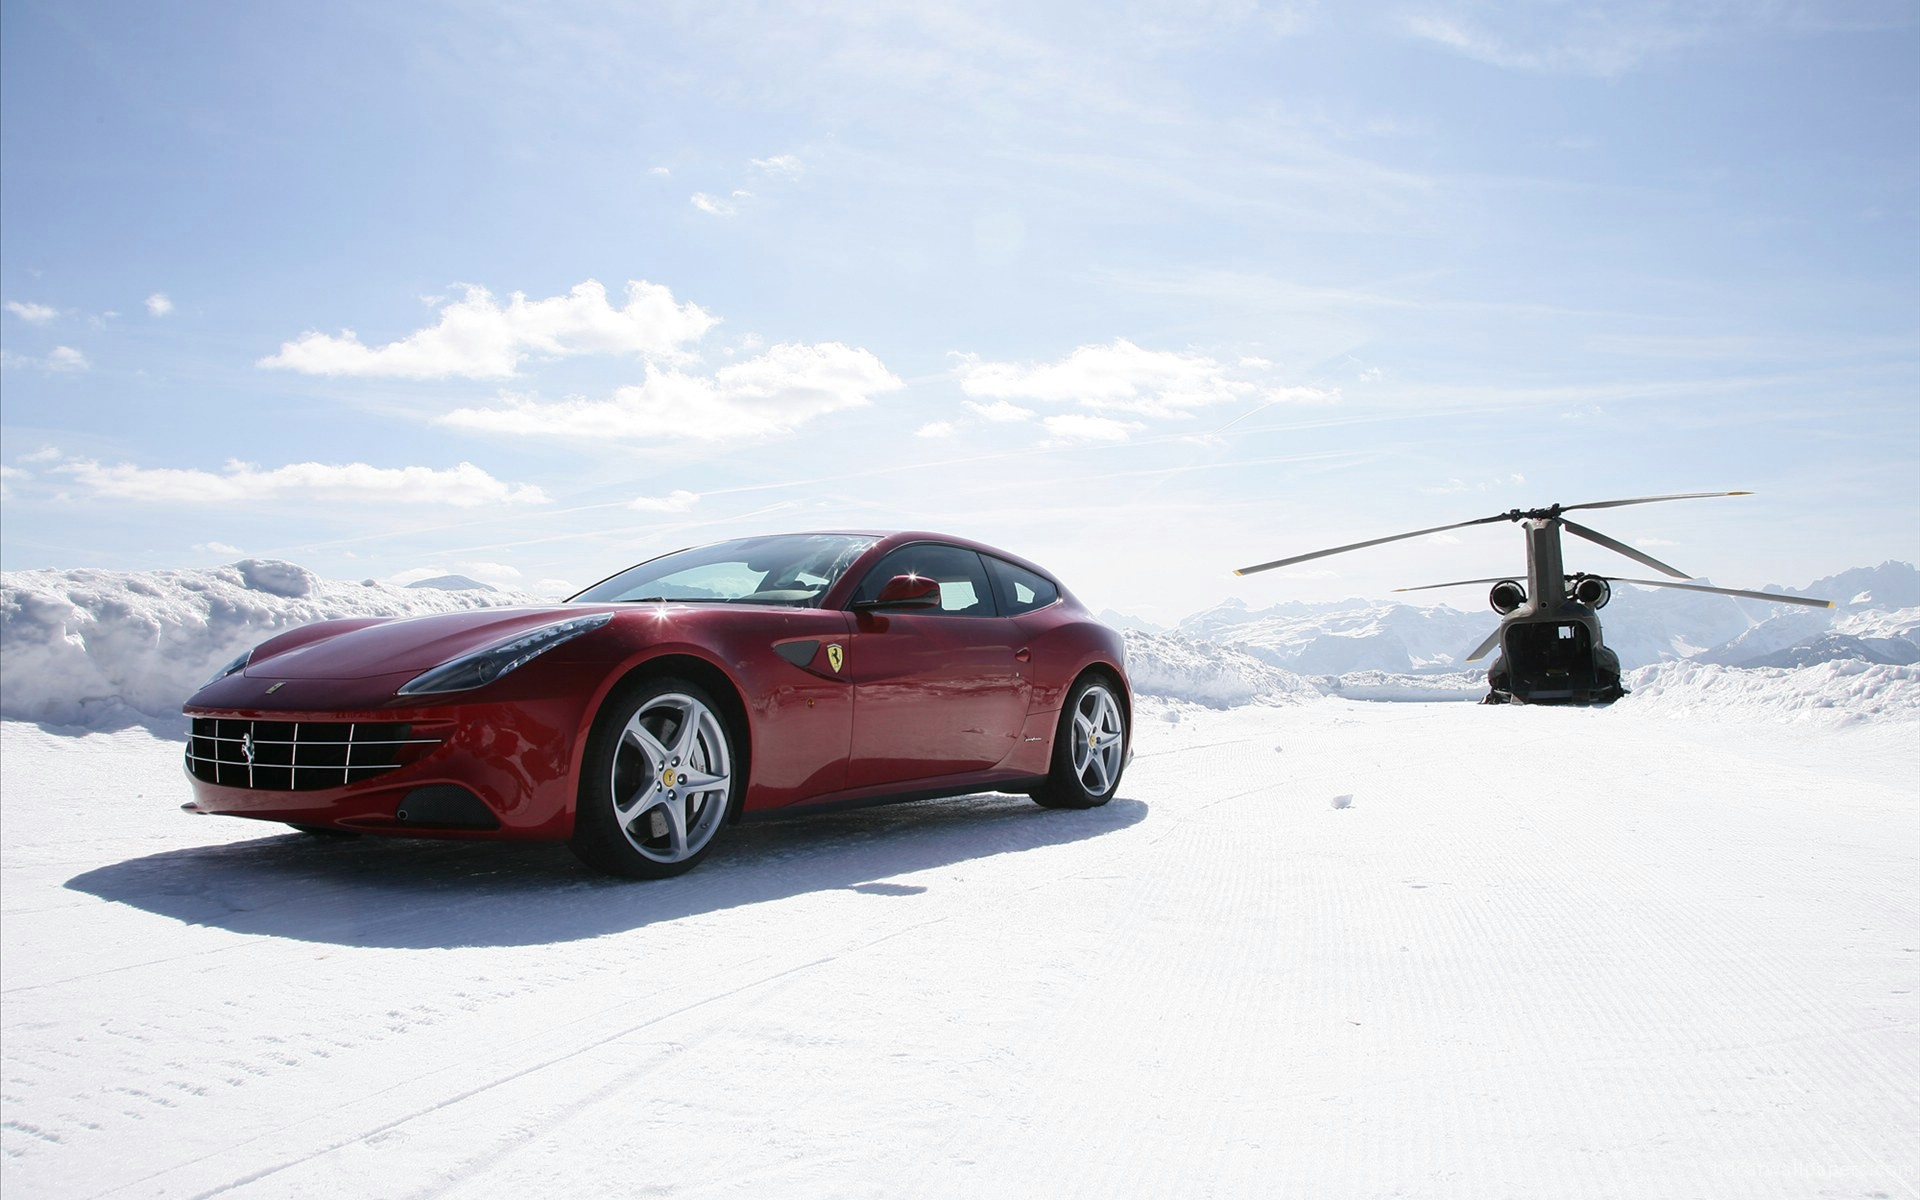 2012 Ferrari Ff Wallpaper Hd Car Wallpapers Id 2077